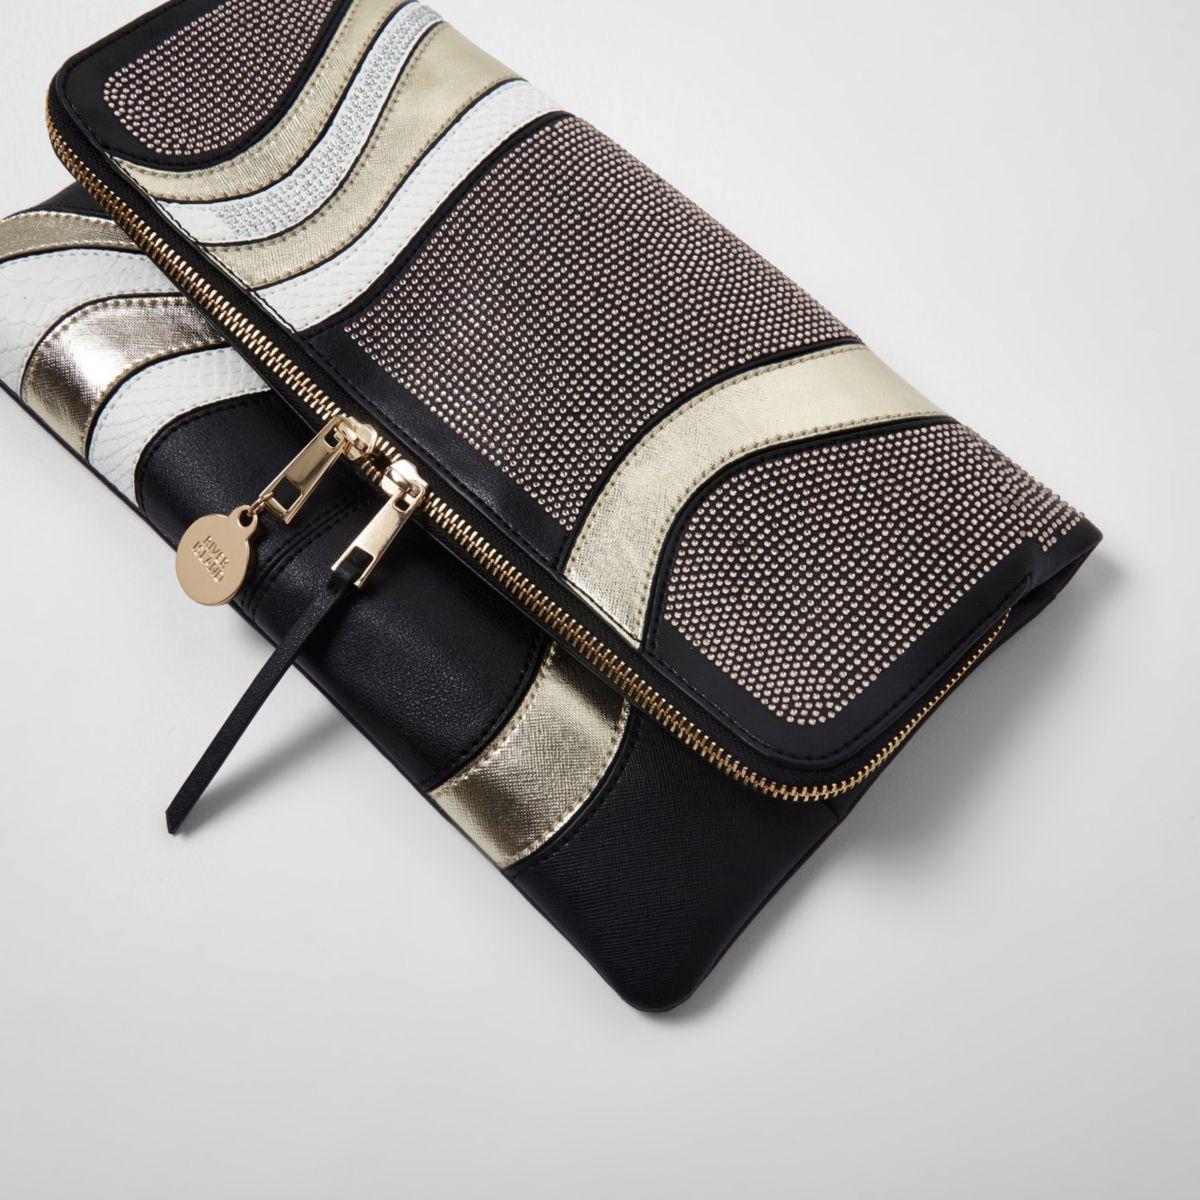 Black heatseal studded foldover clutch bag